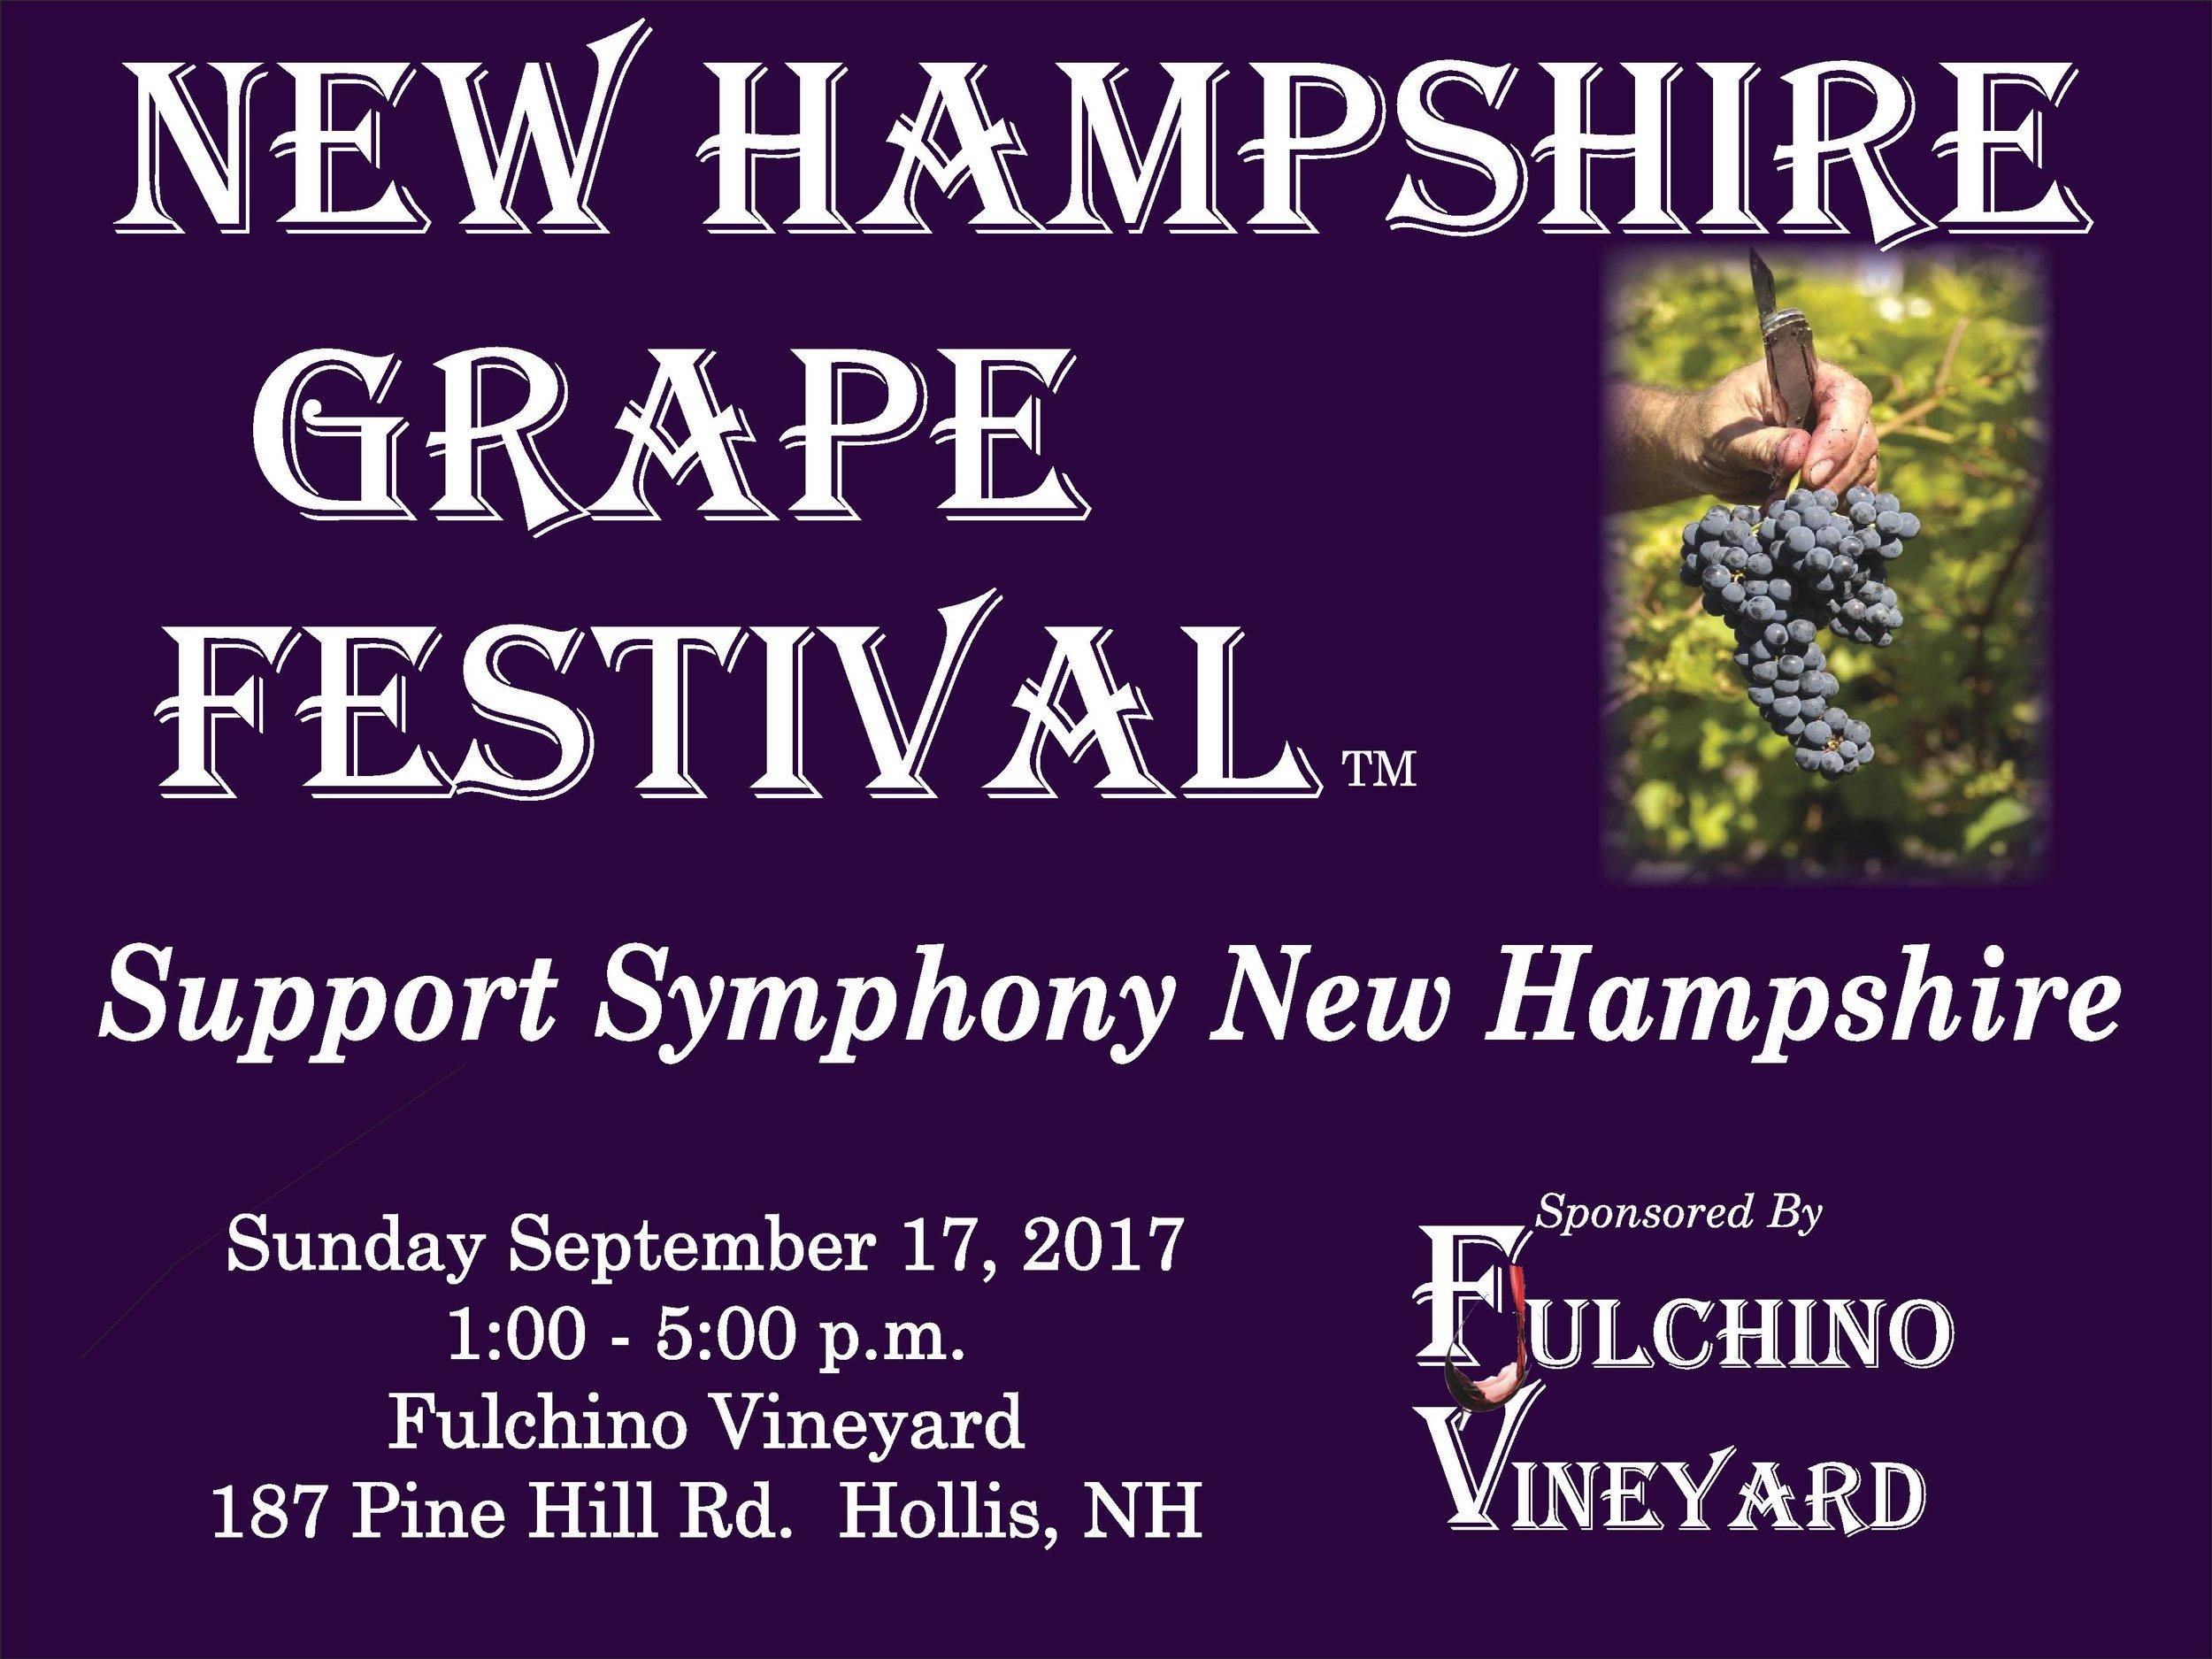 2017 NH Grape Festival 24 x 18 signs-page-001.jpg